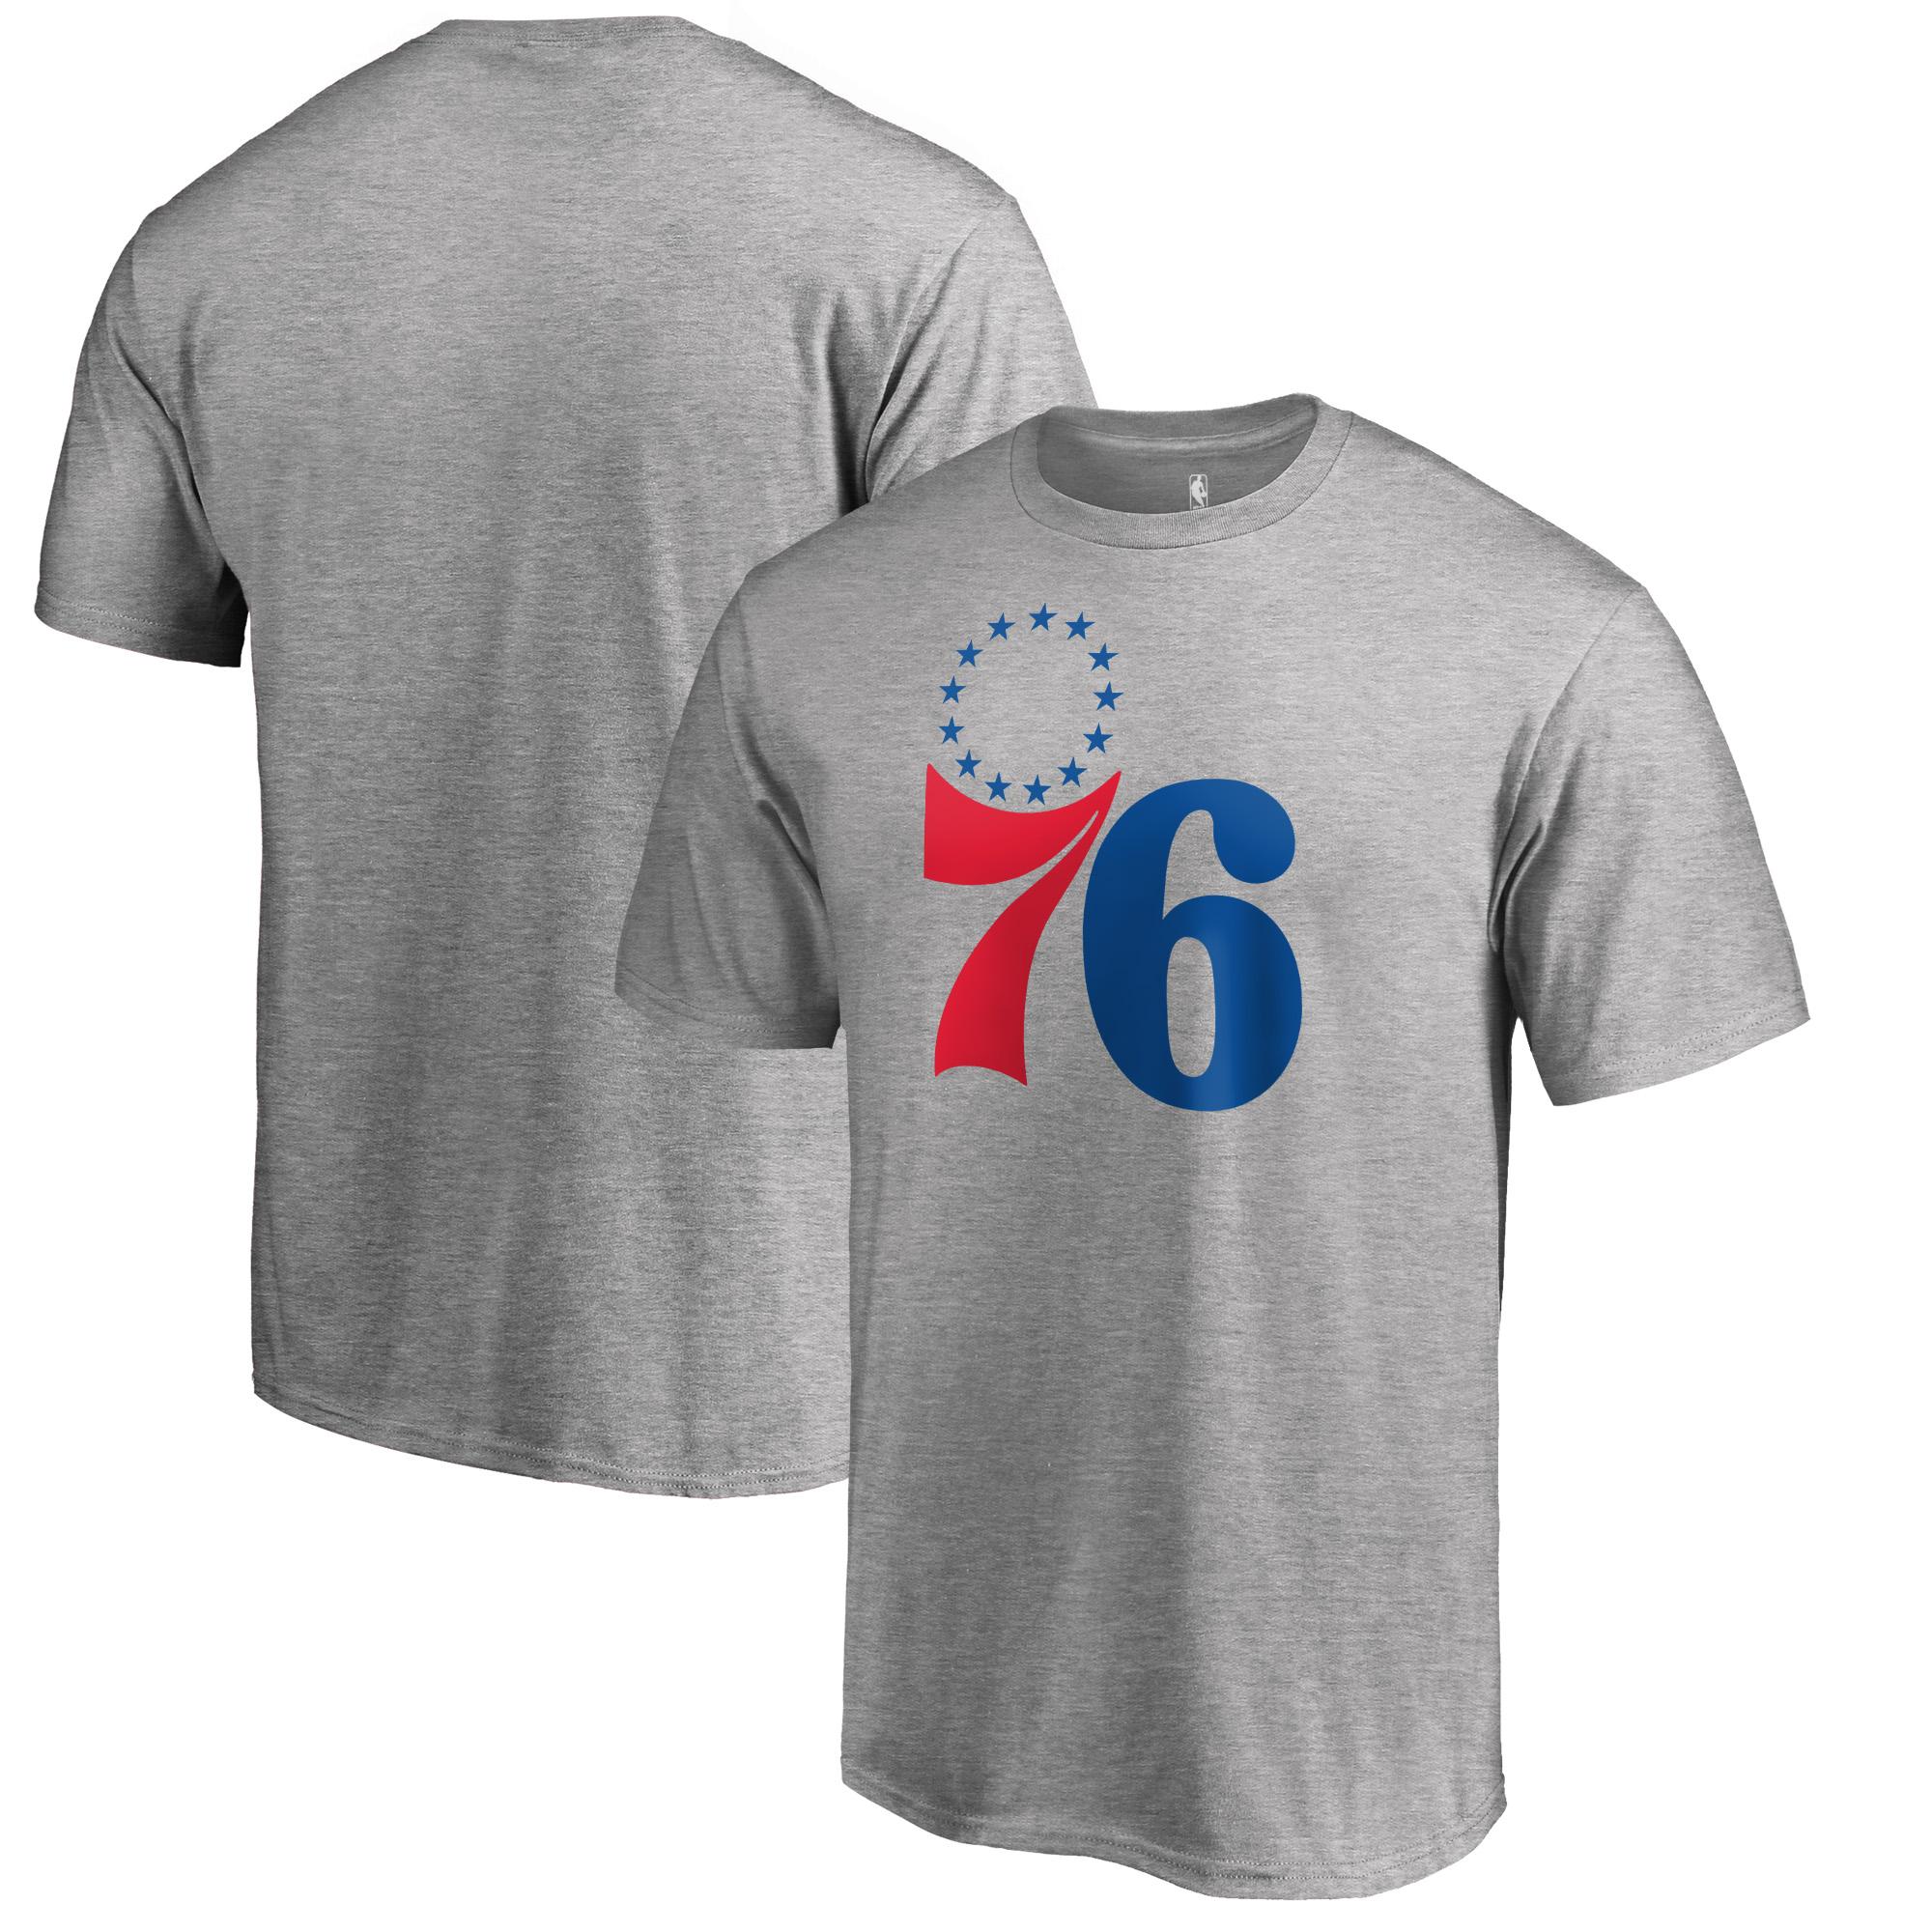 Philadelphia 76ers Fanatics Branded Secondary Logo T-Shirt - Heather Gray